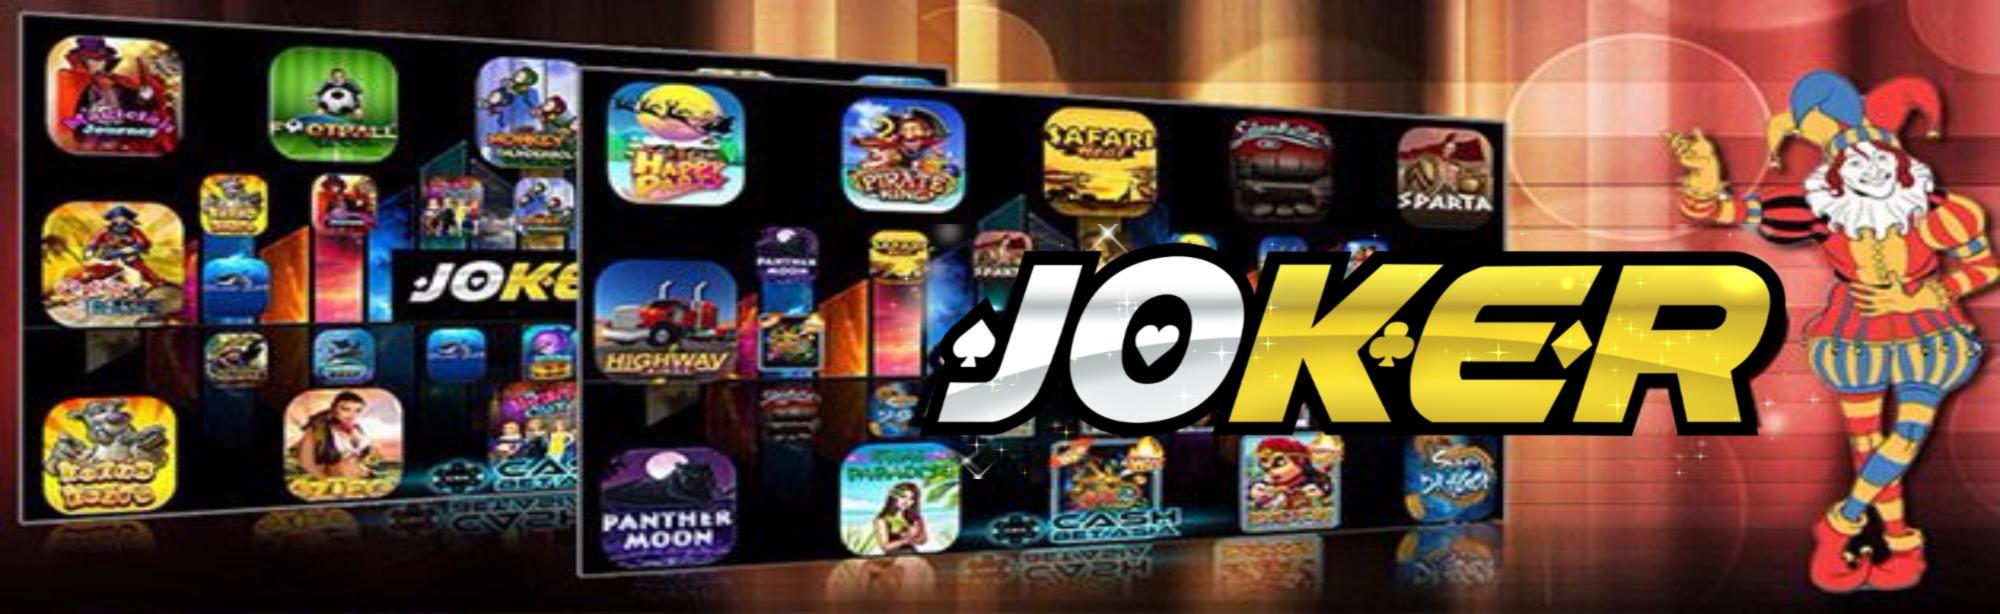 90% bonus za casino utakmicu na Inet Bet